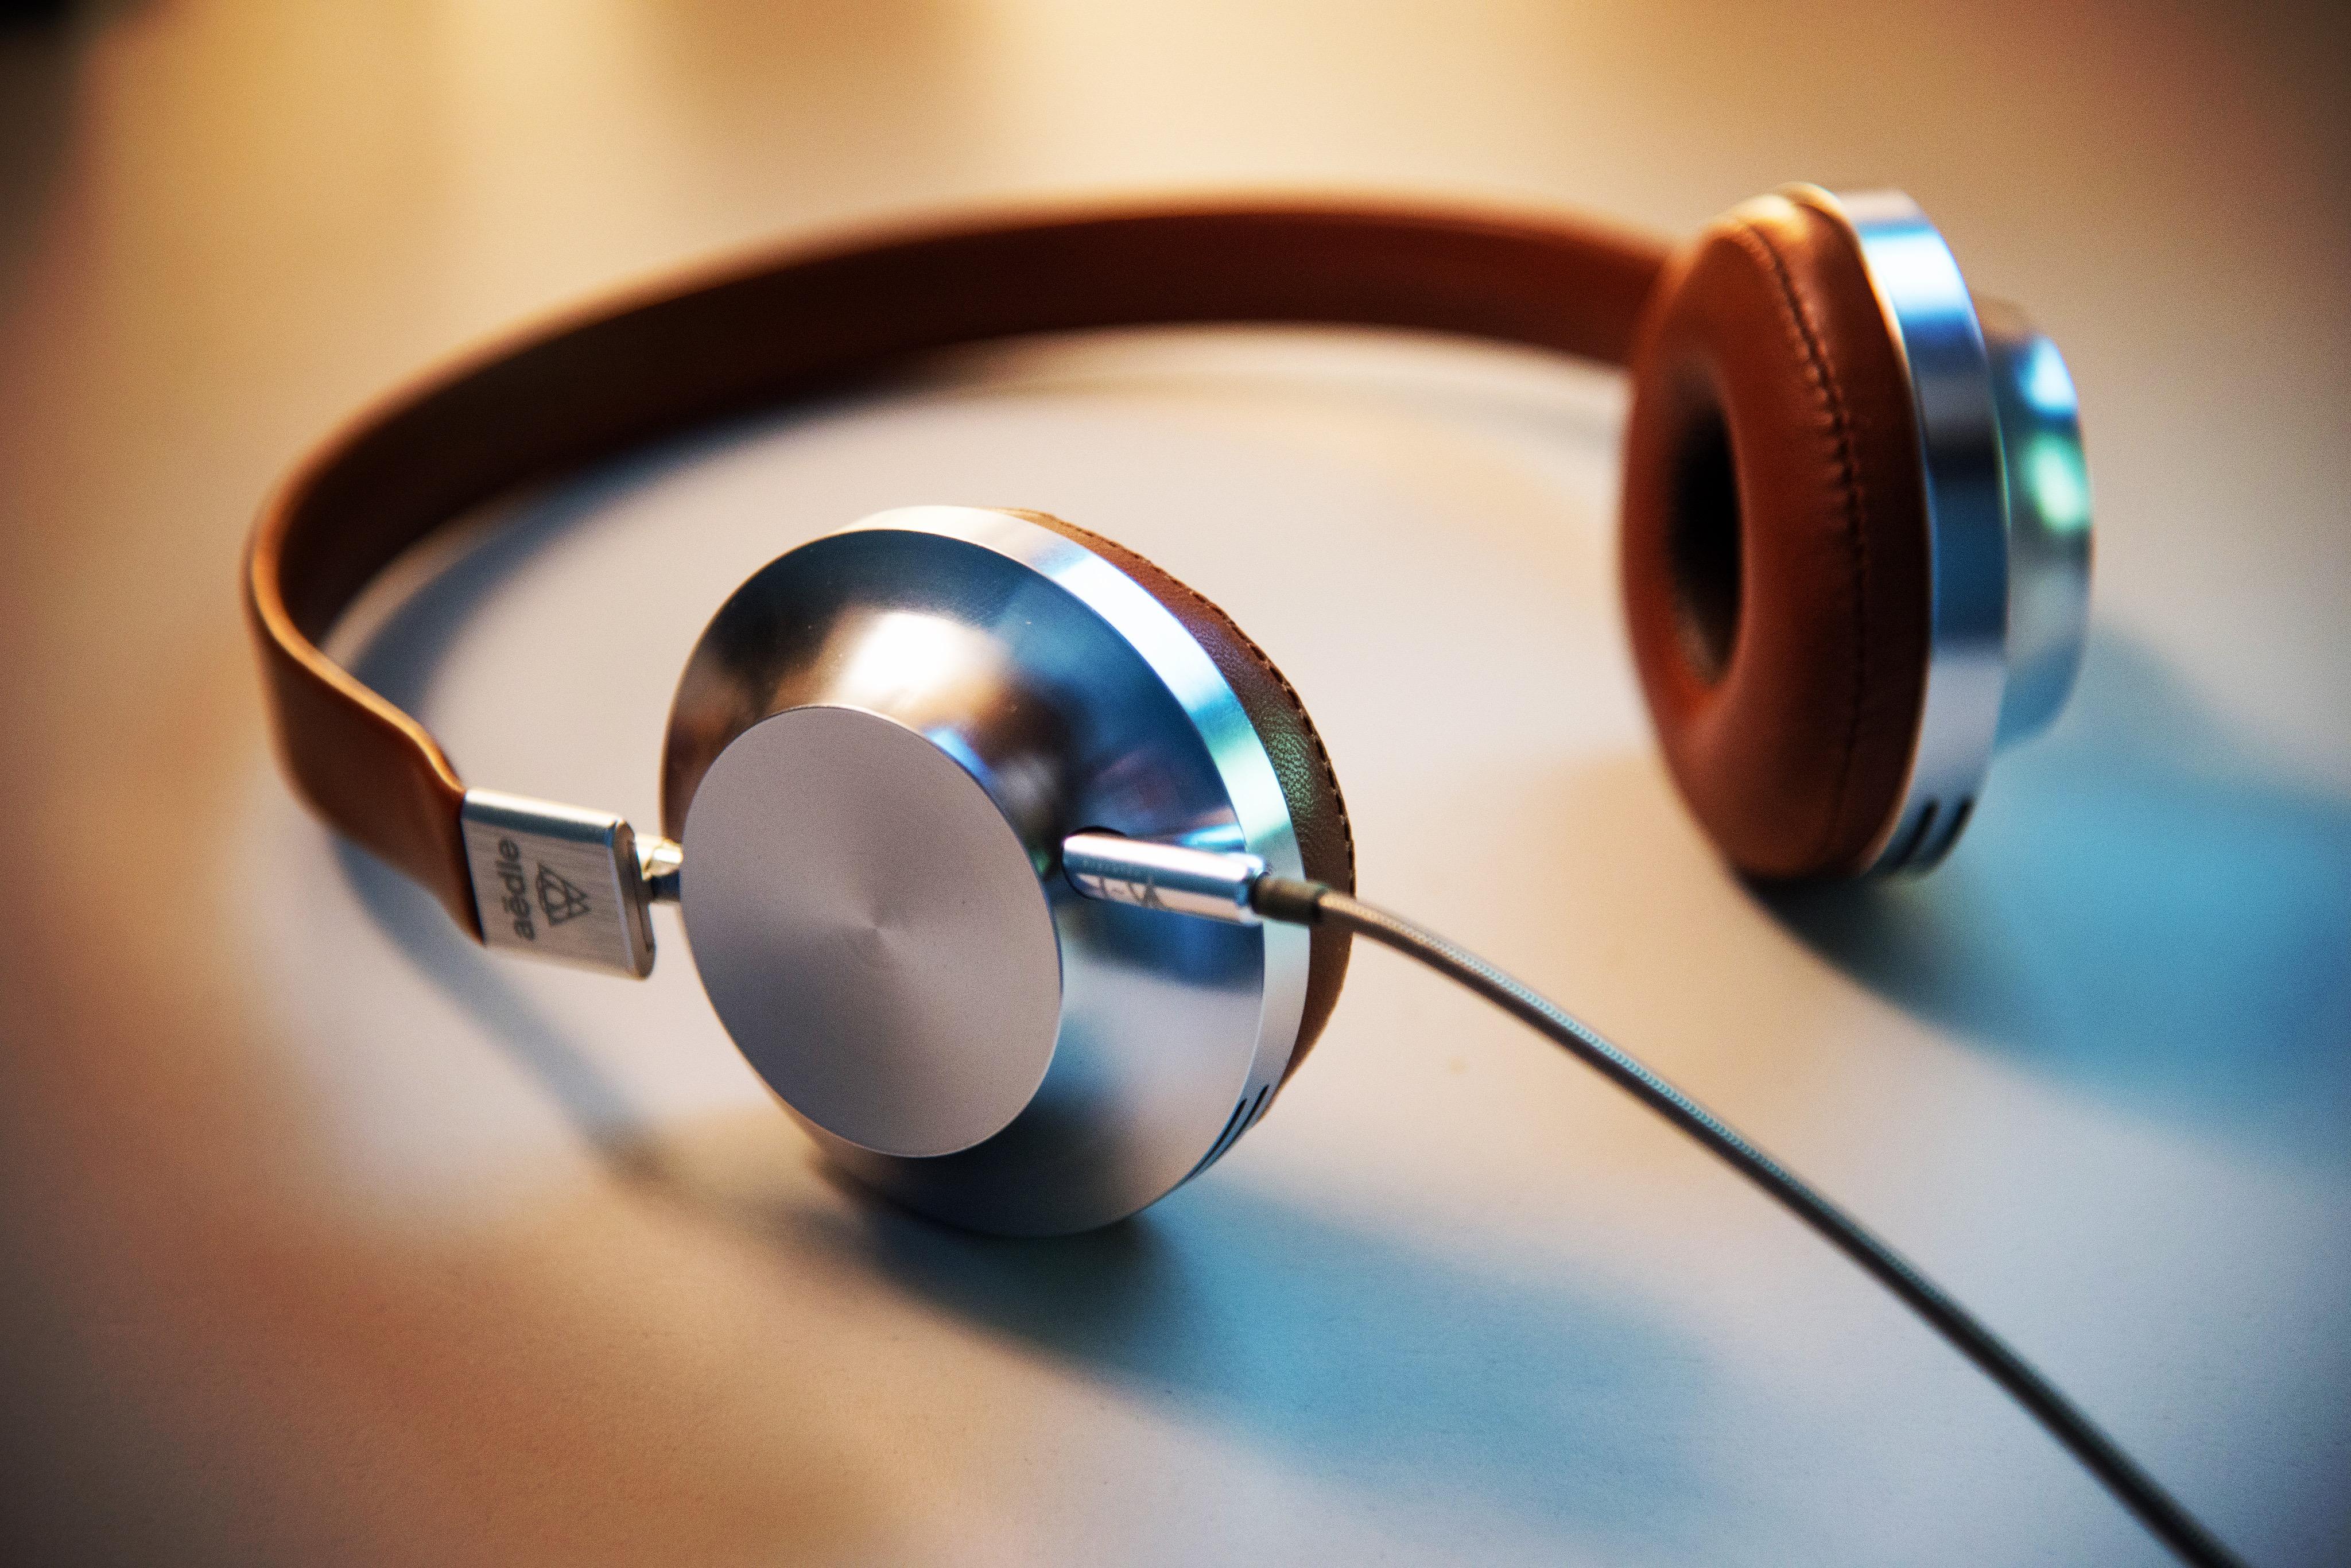 Free Images : technology, headphone, gadget, blue, ear ...